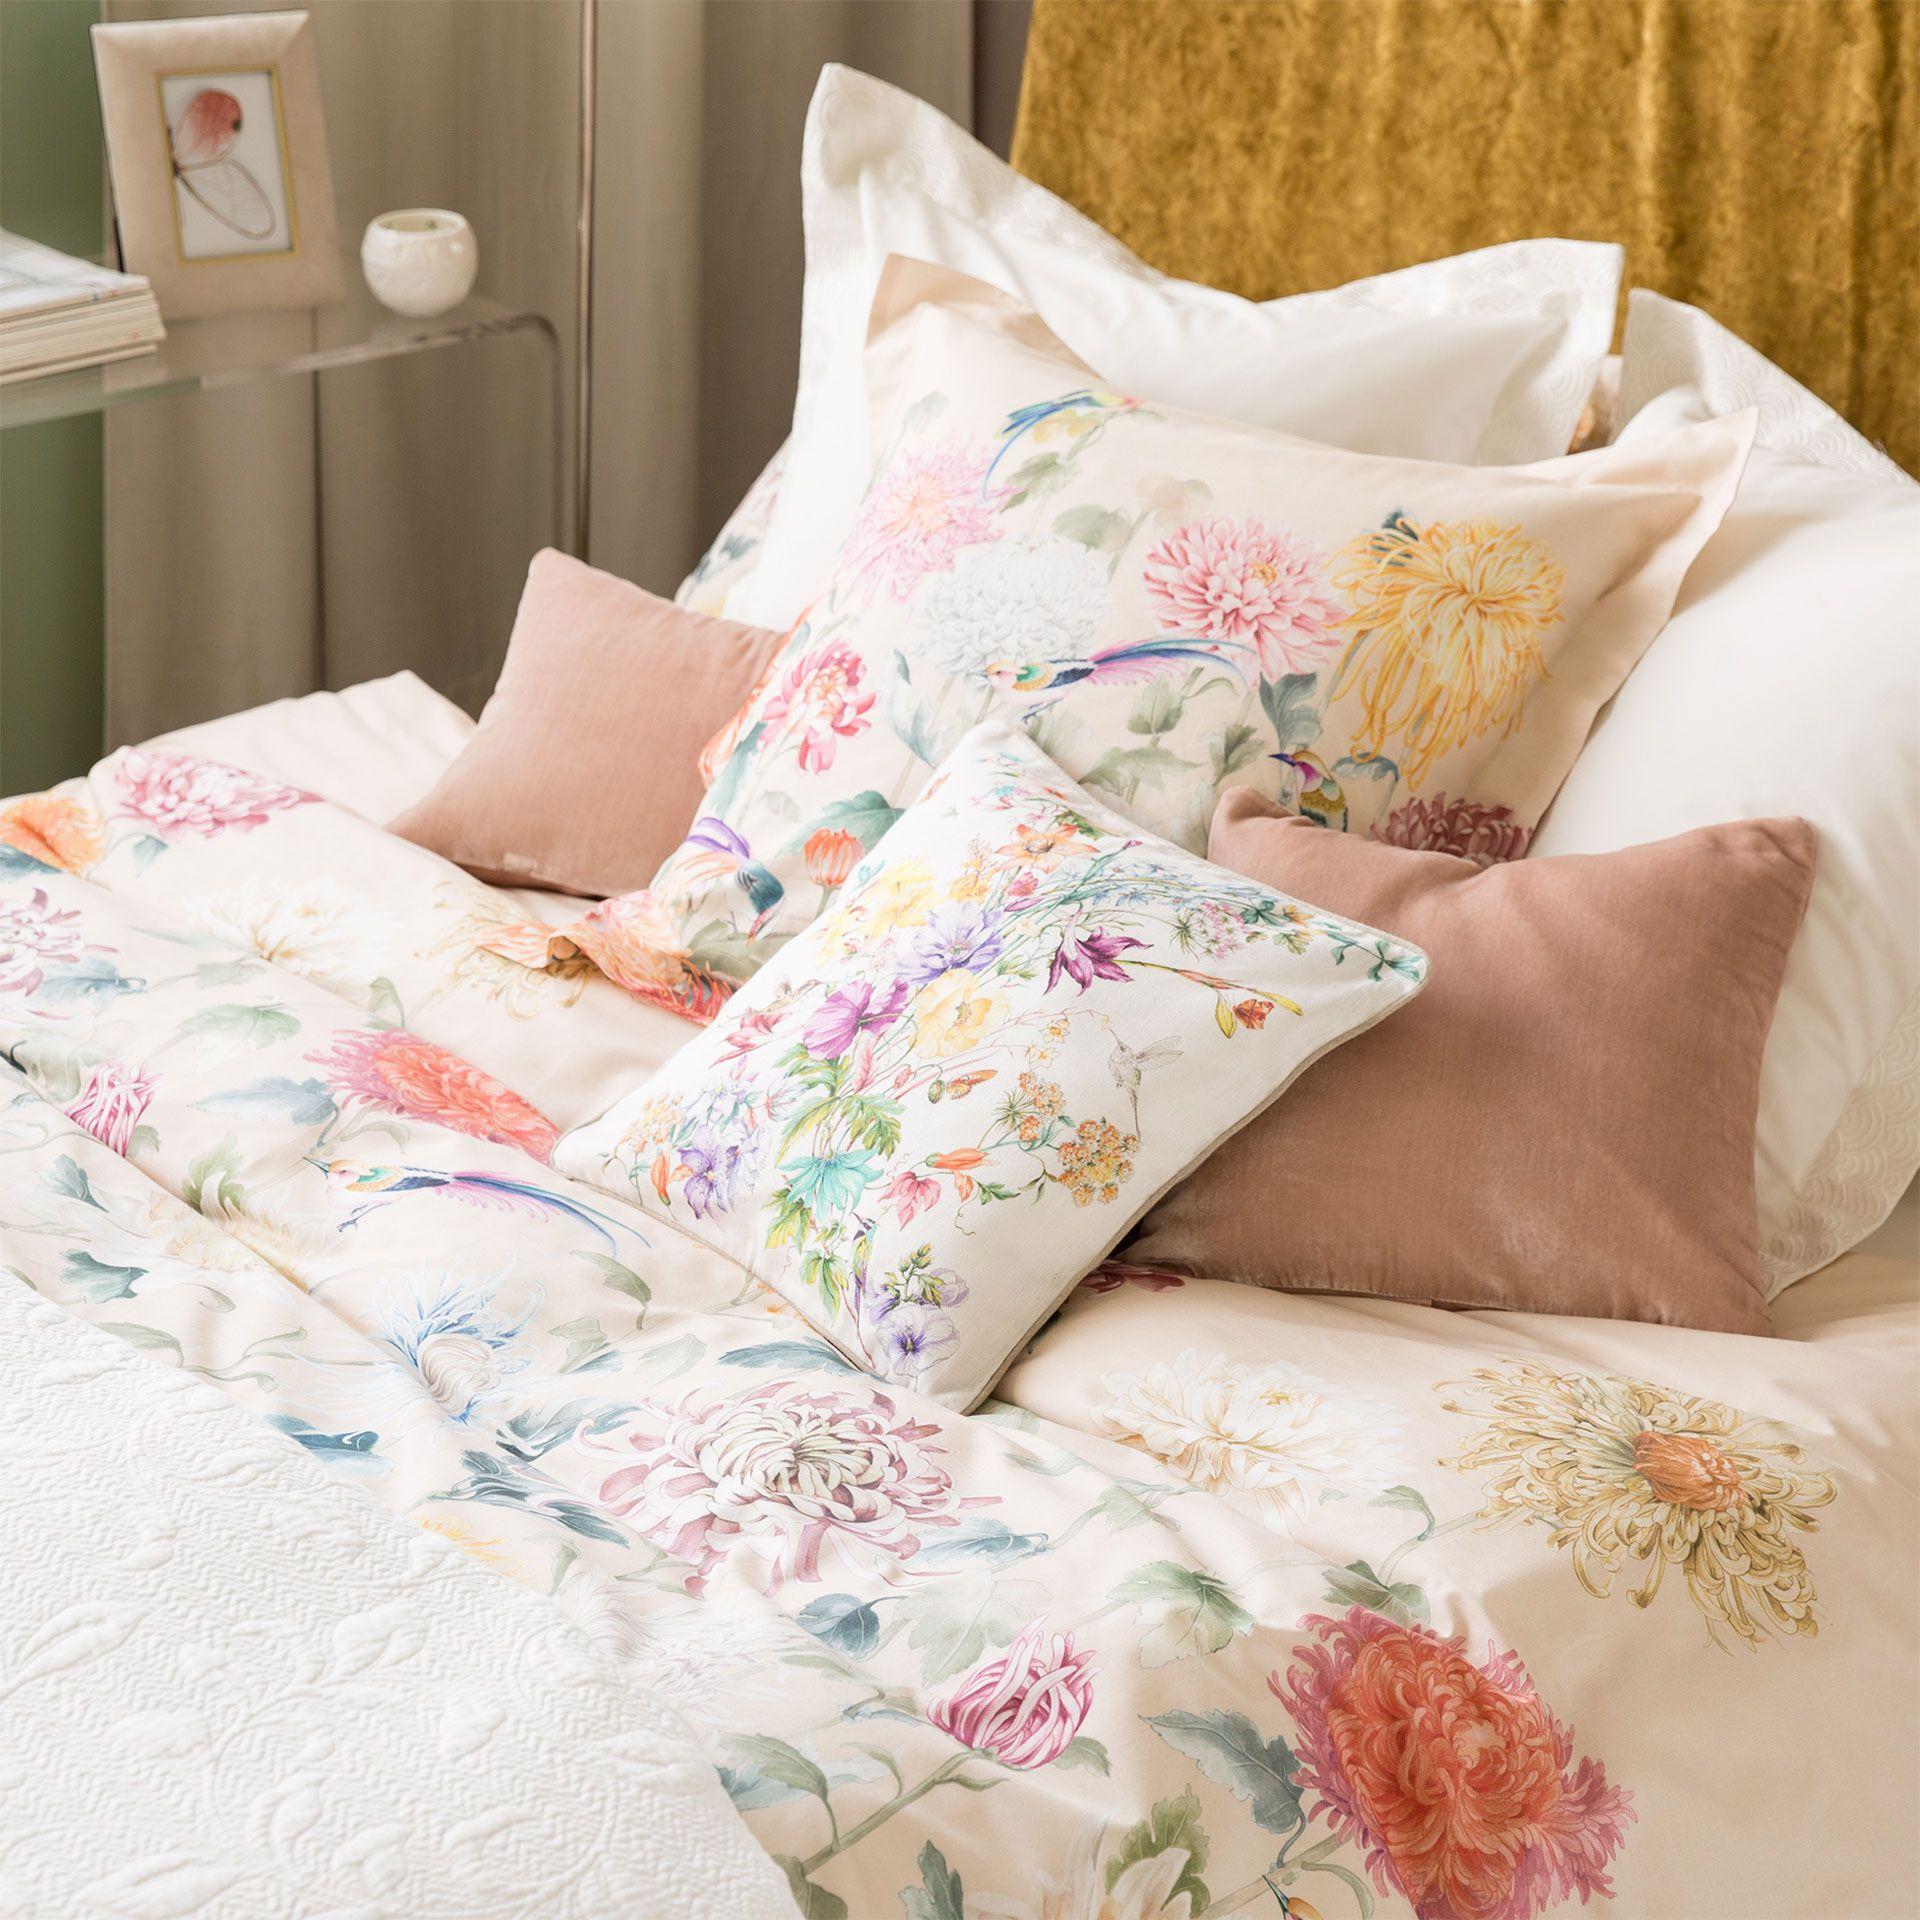 Chrysanthemum Print Bed Linen Orientalism Collection Bedroom